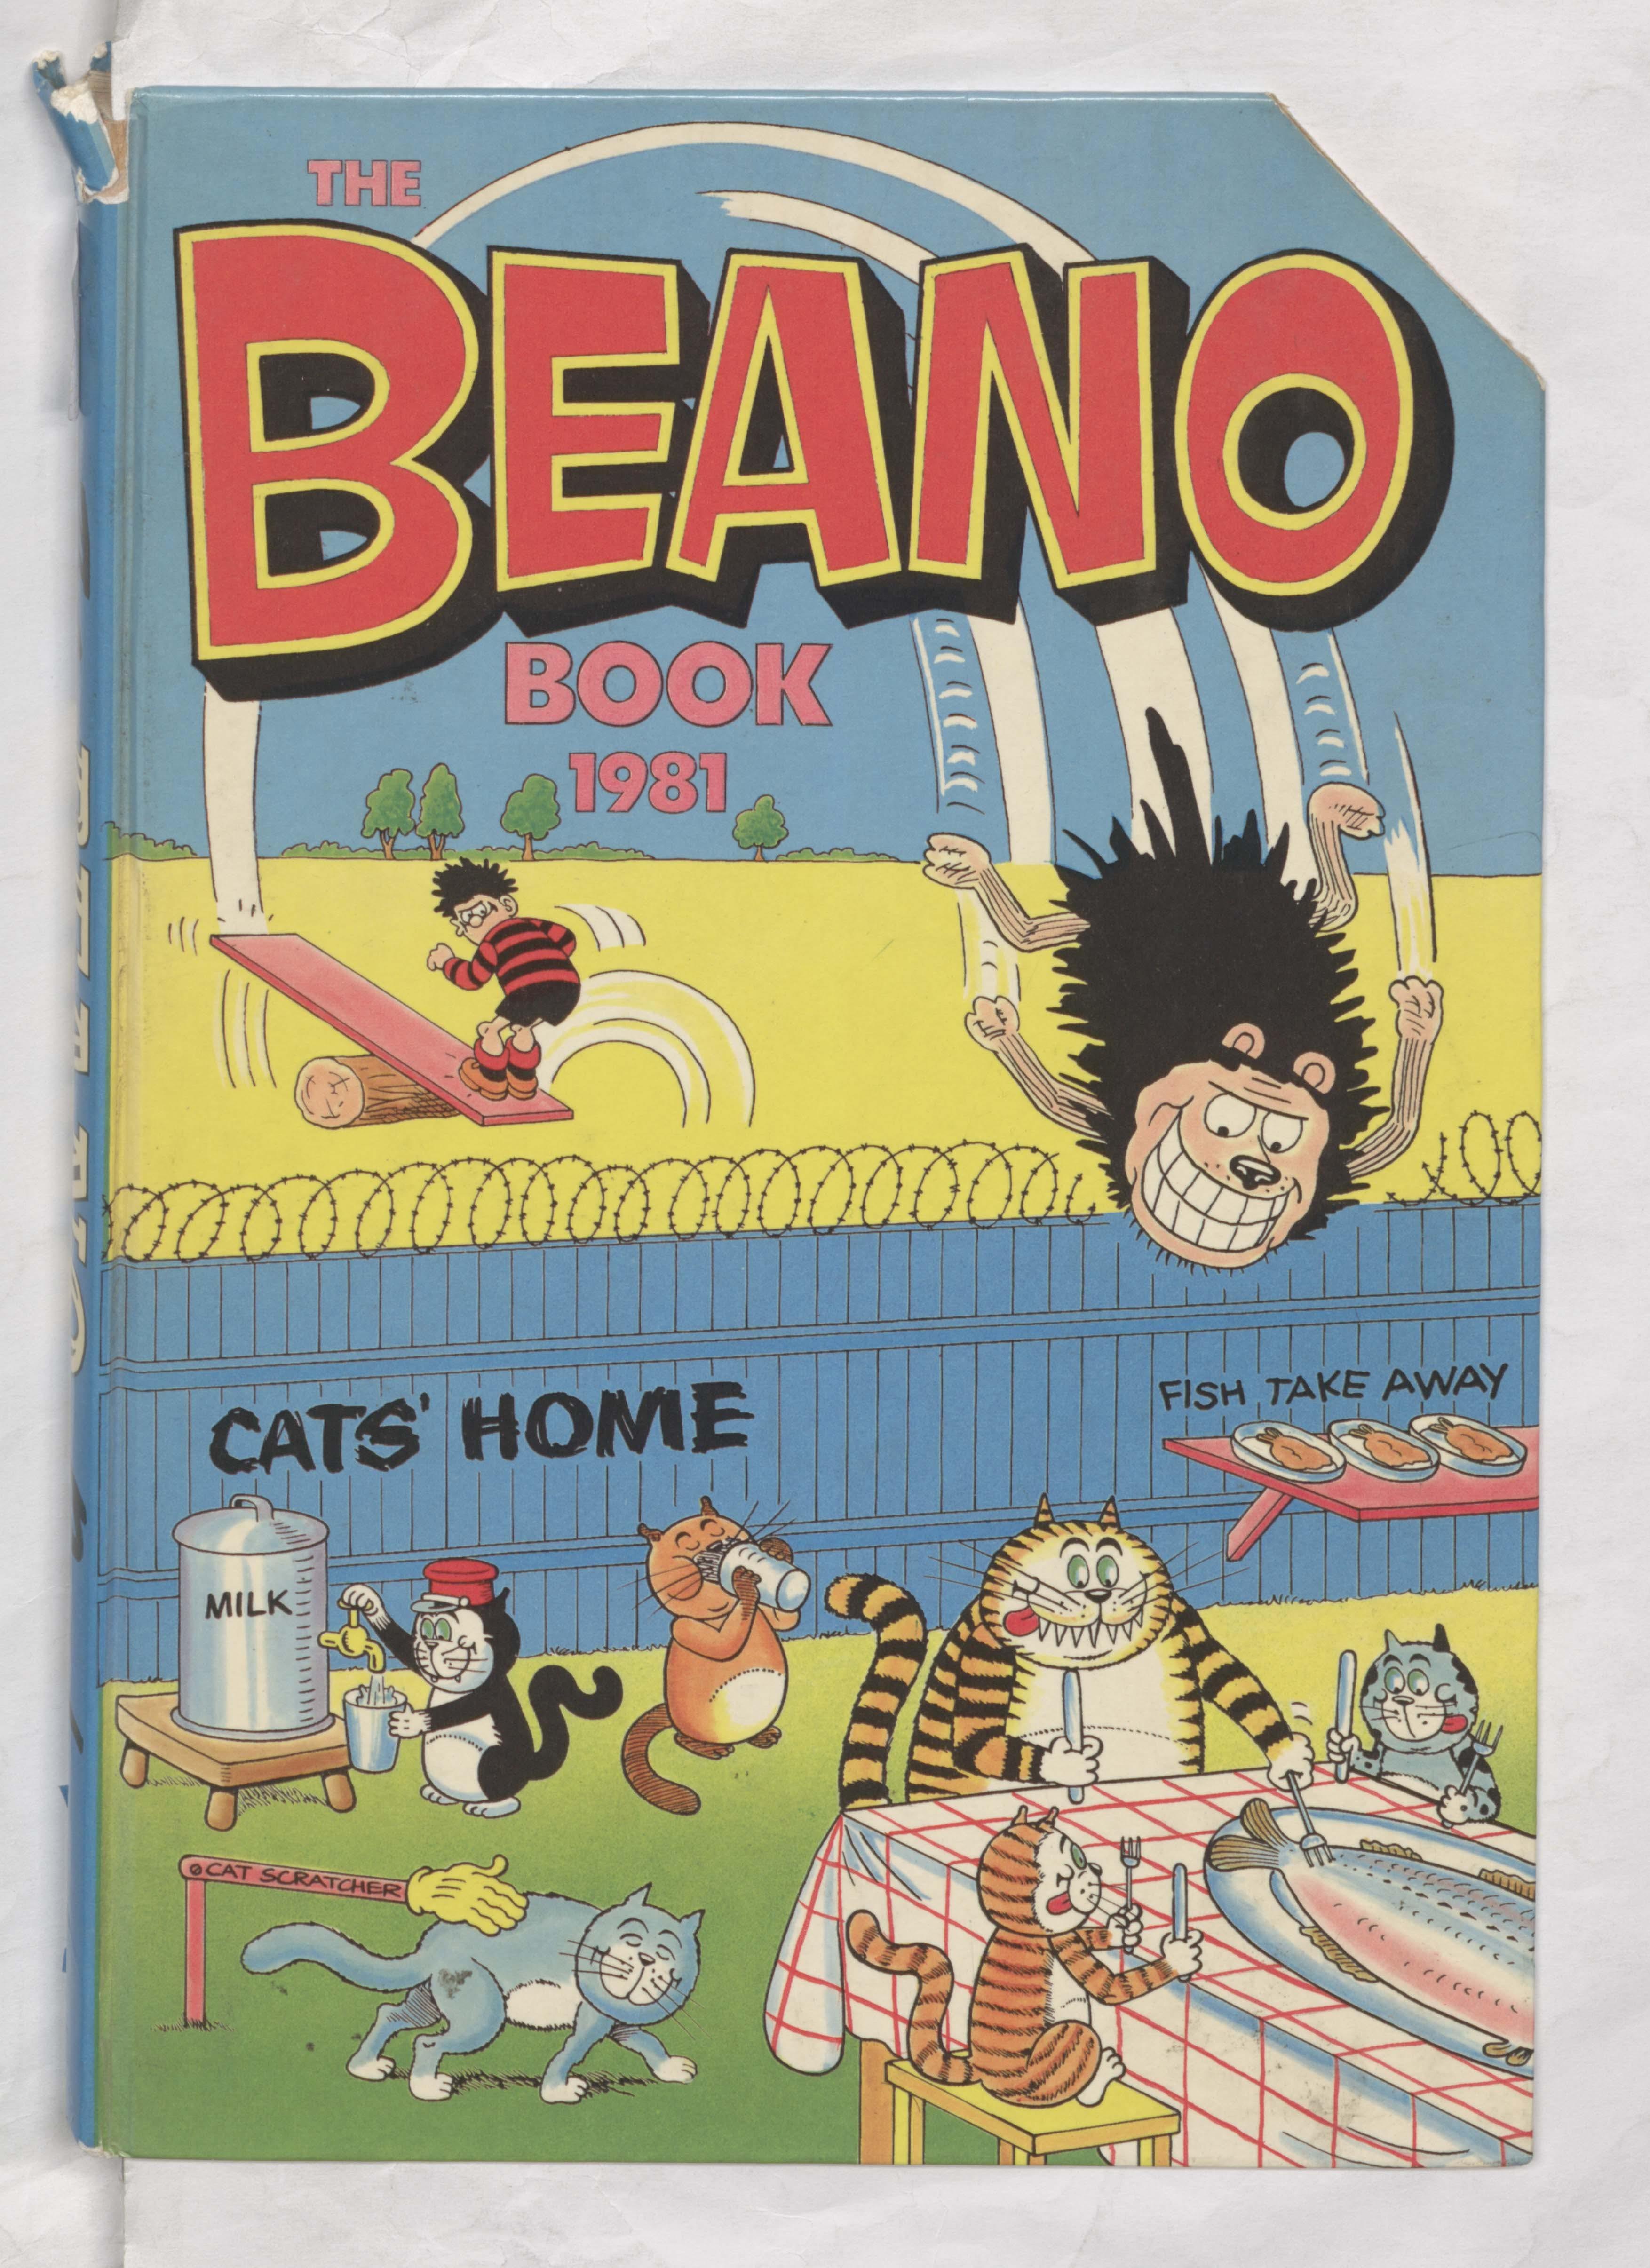 Beano Book 1981 Annual Cover